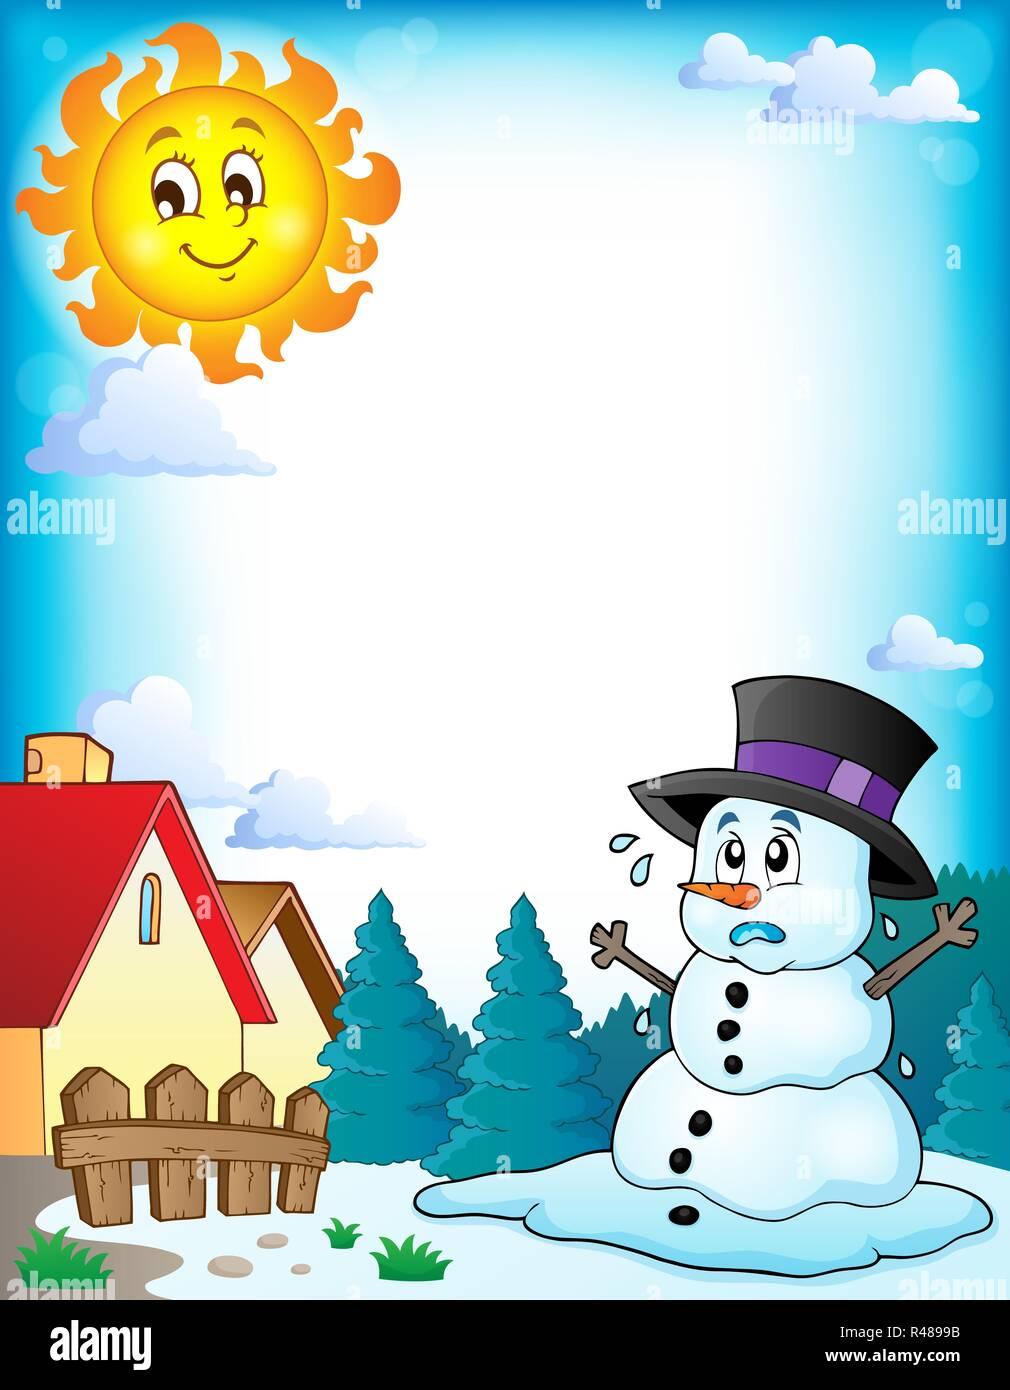 Melting Snowman Sun Stock Photos & Melting Snowman Sun Stock